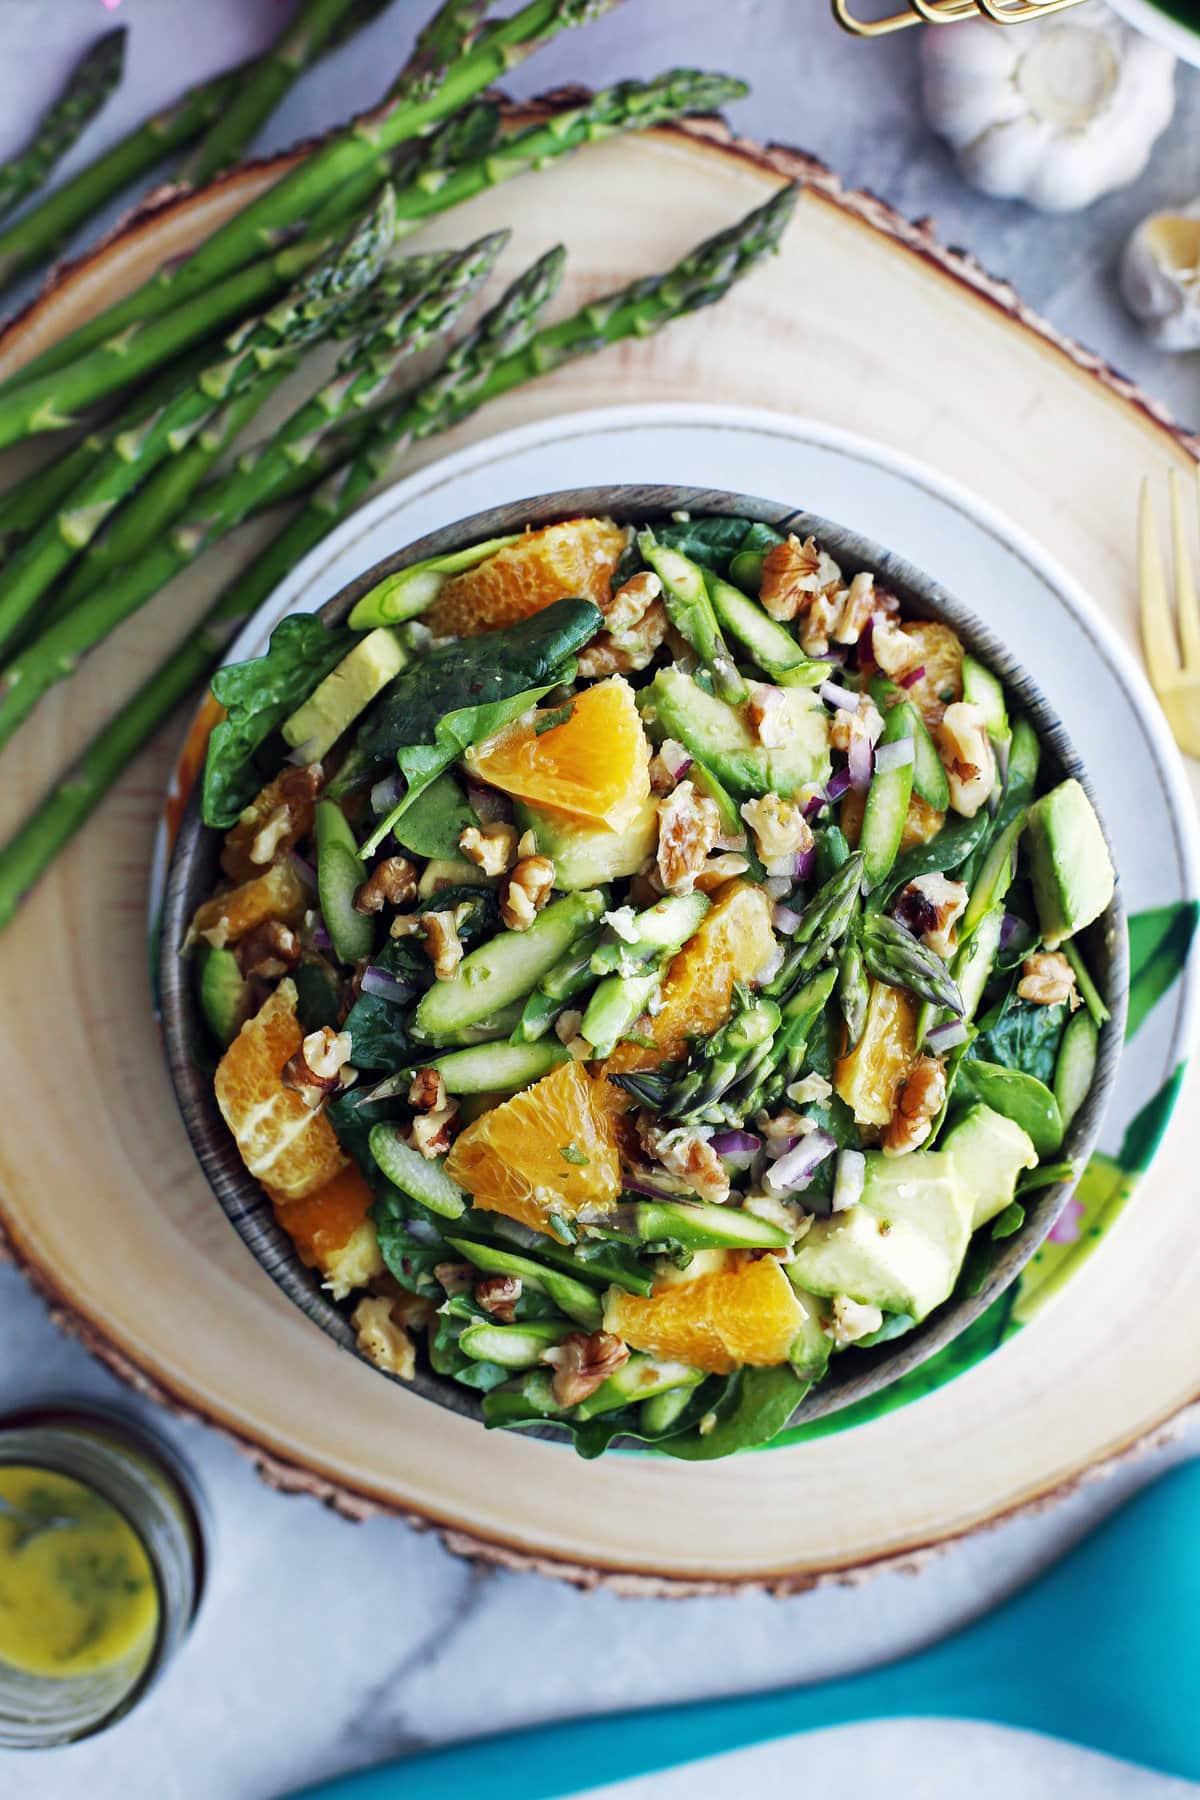 40 delicious & healthy vegan salad recipes picture of asparagus orange salad for recipe roundup